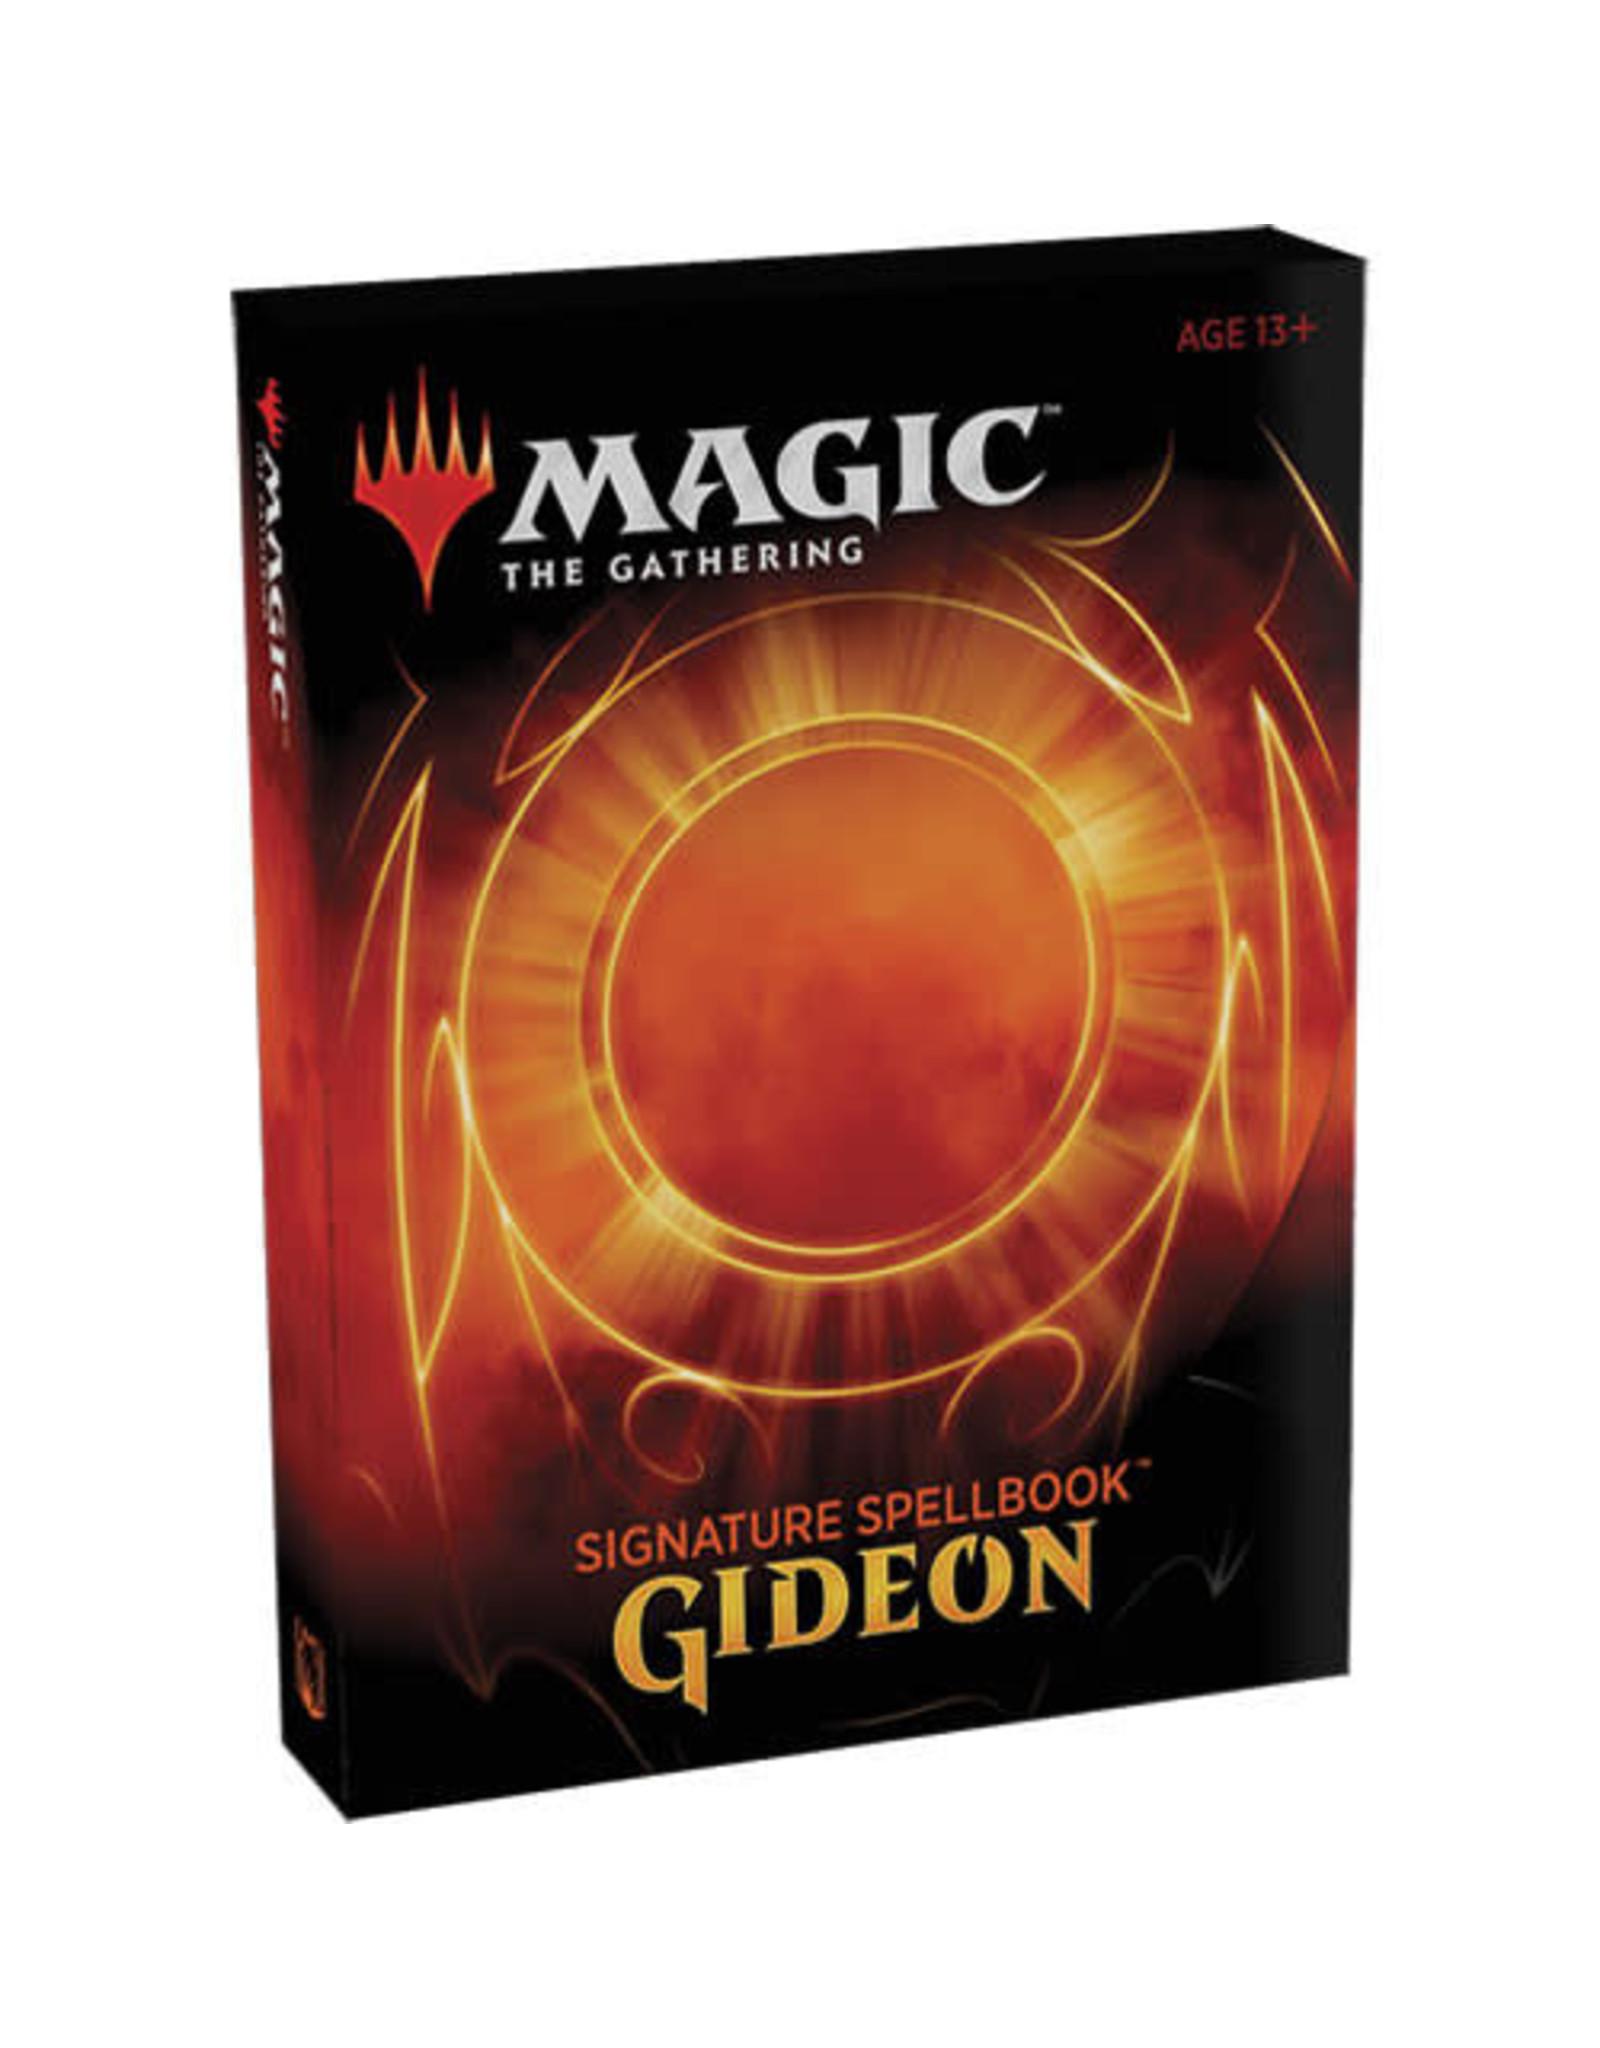 Wizards of the Coast Magic the Gathering: Signature Spellbook Gideon - Box Set